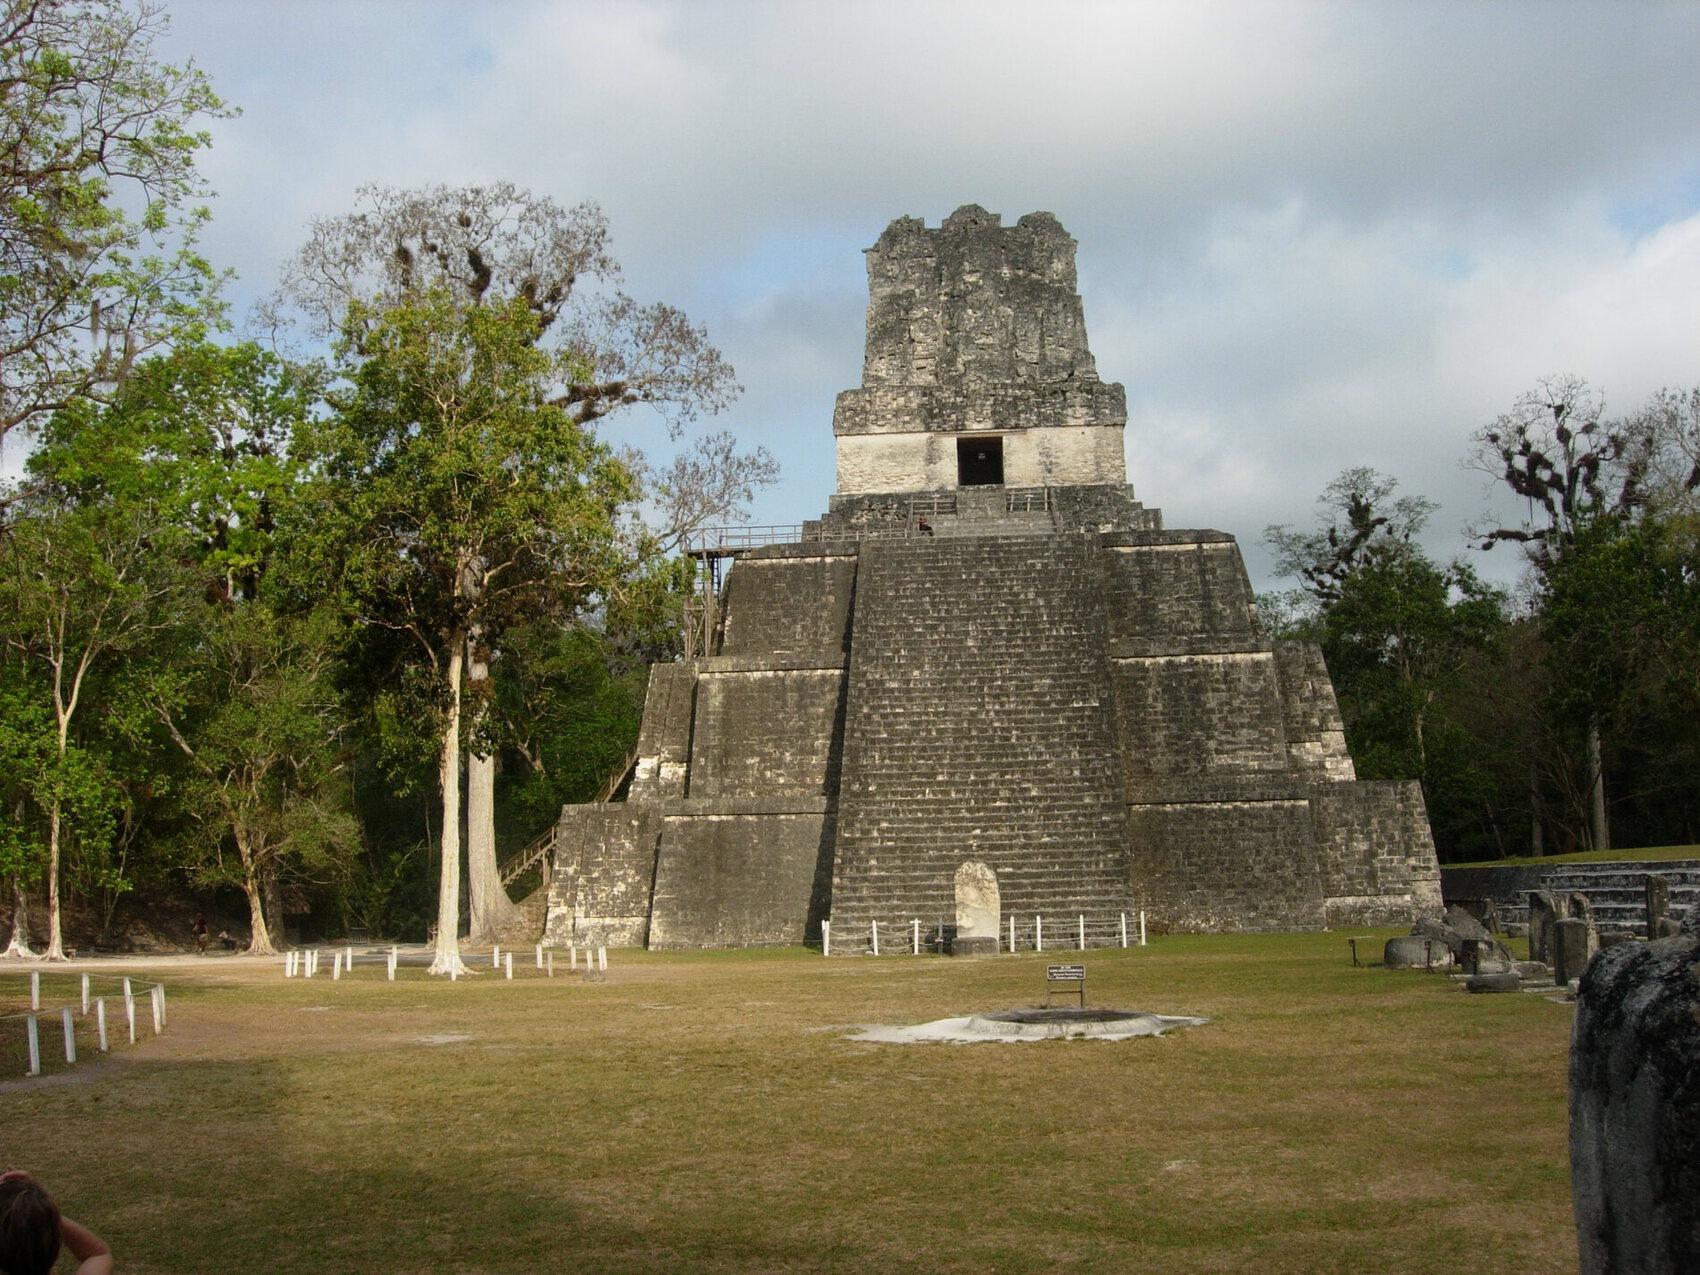 la pyramide du jaguar